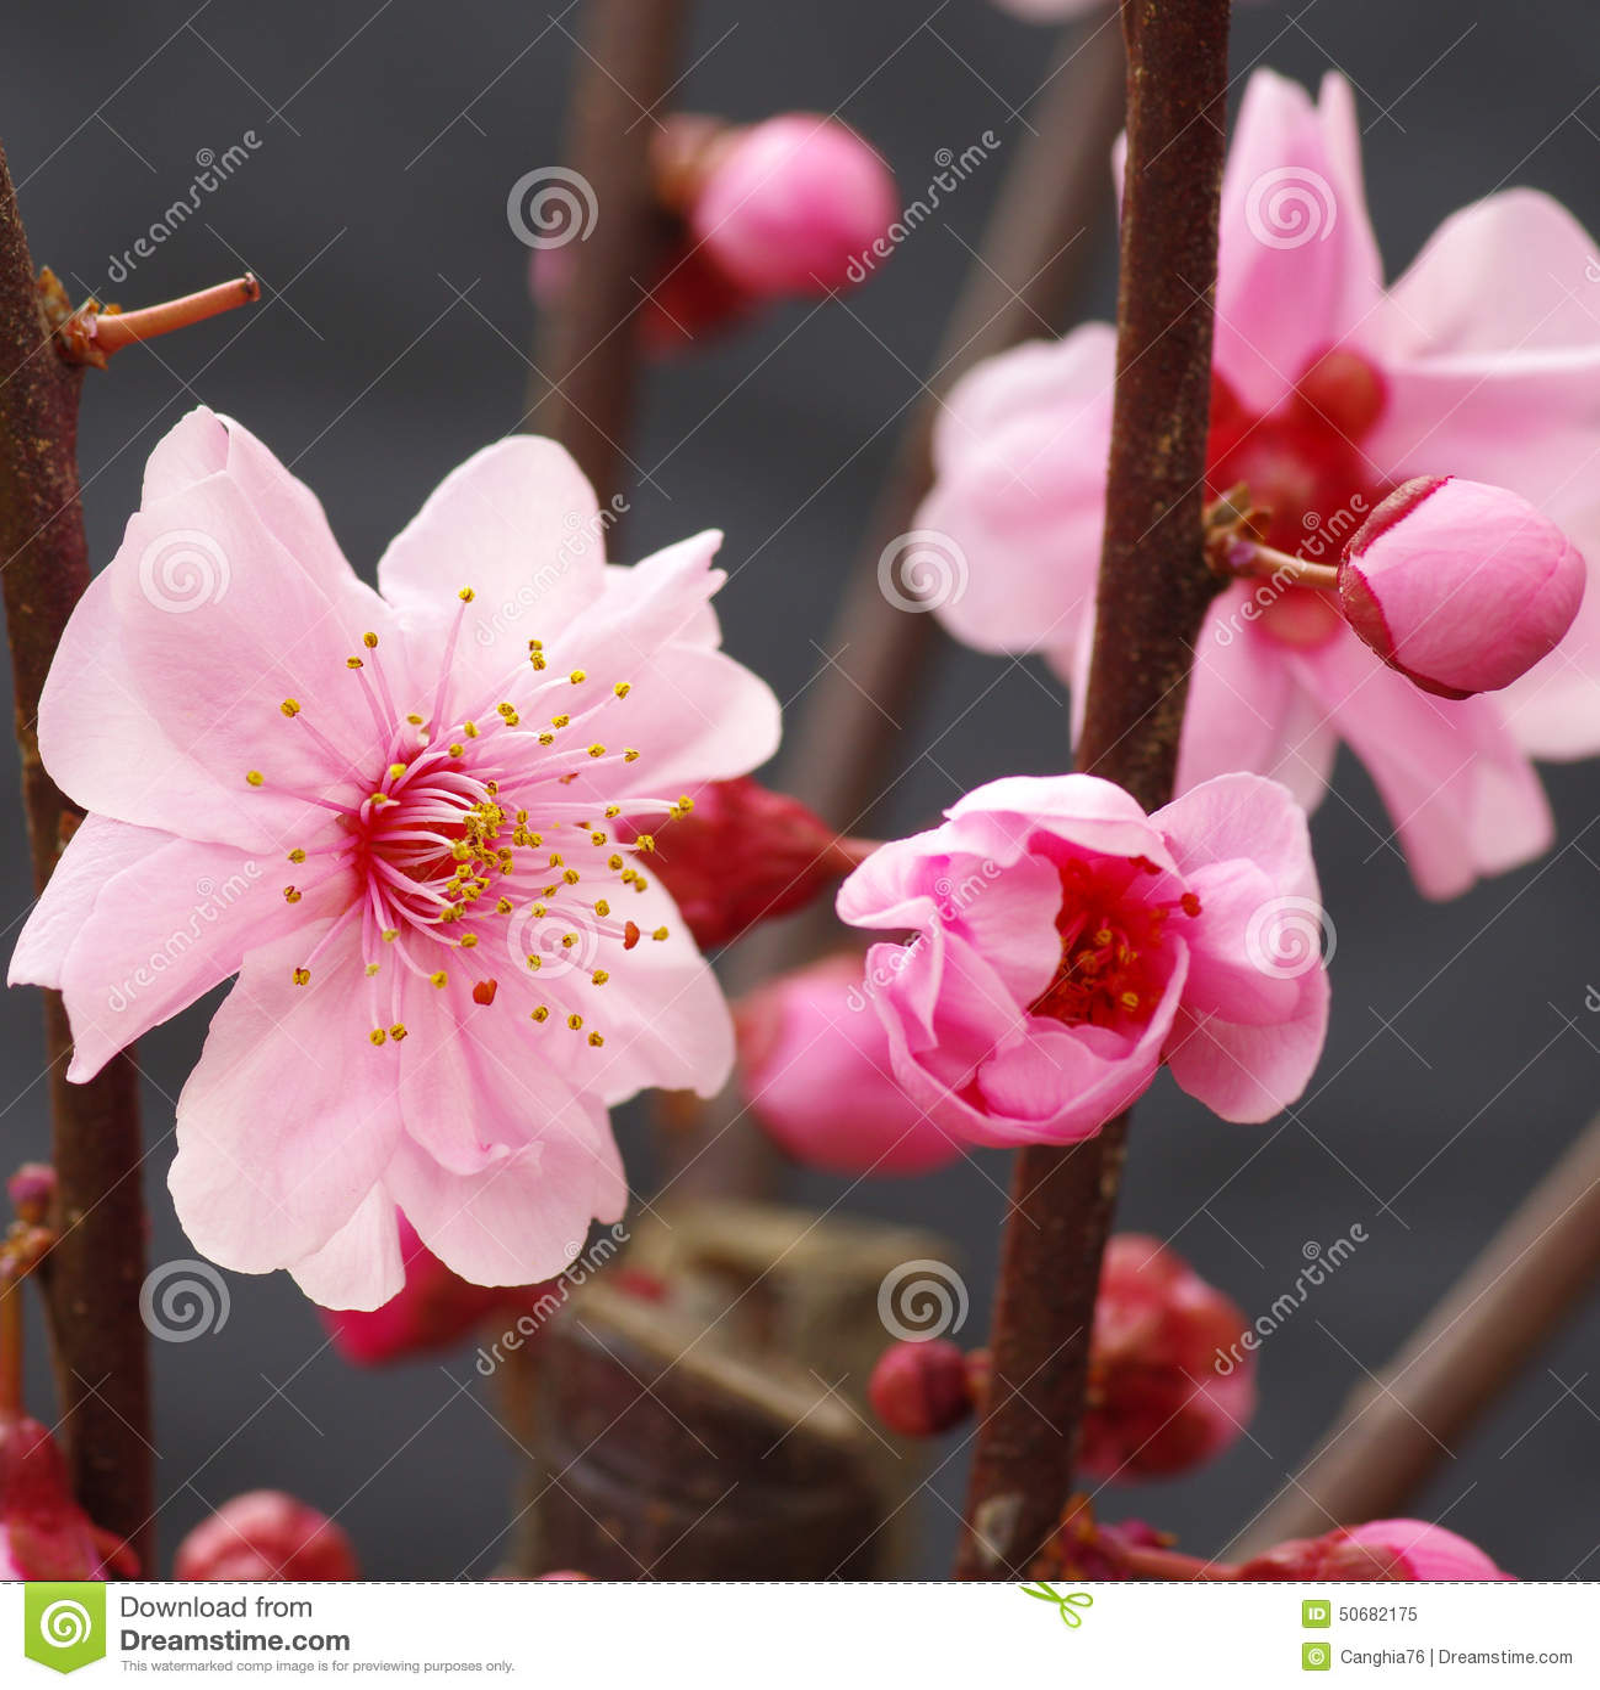 Download 李子花开花 库存图片. 图片 包括有 工厂, brander, 空白, 开花, 芬芳, 自然, 新鲜, 格式 - 50682175